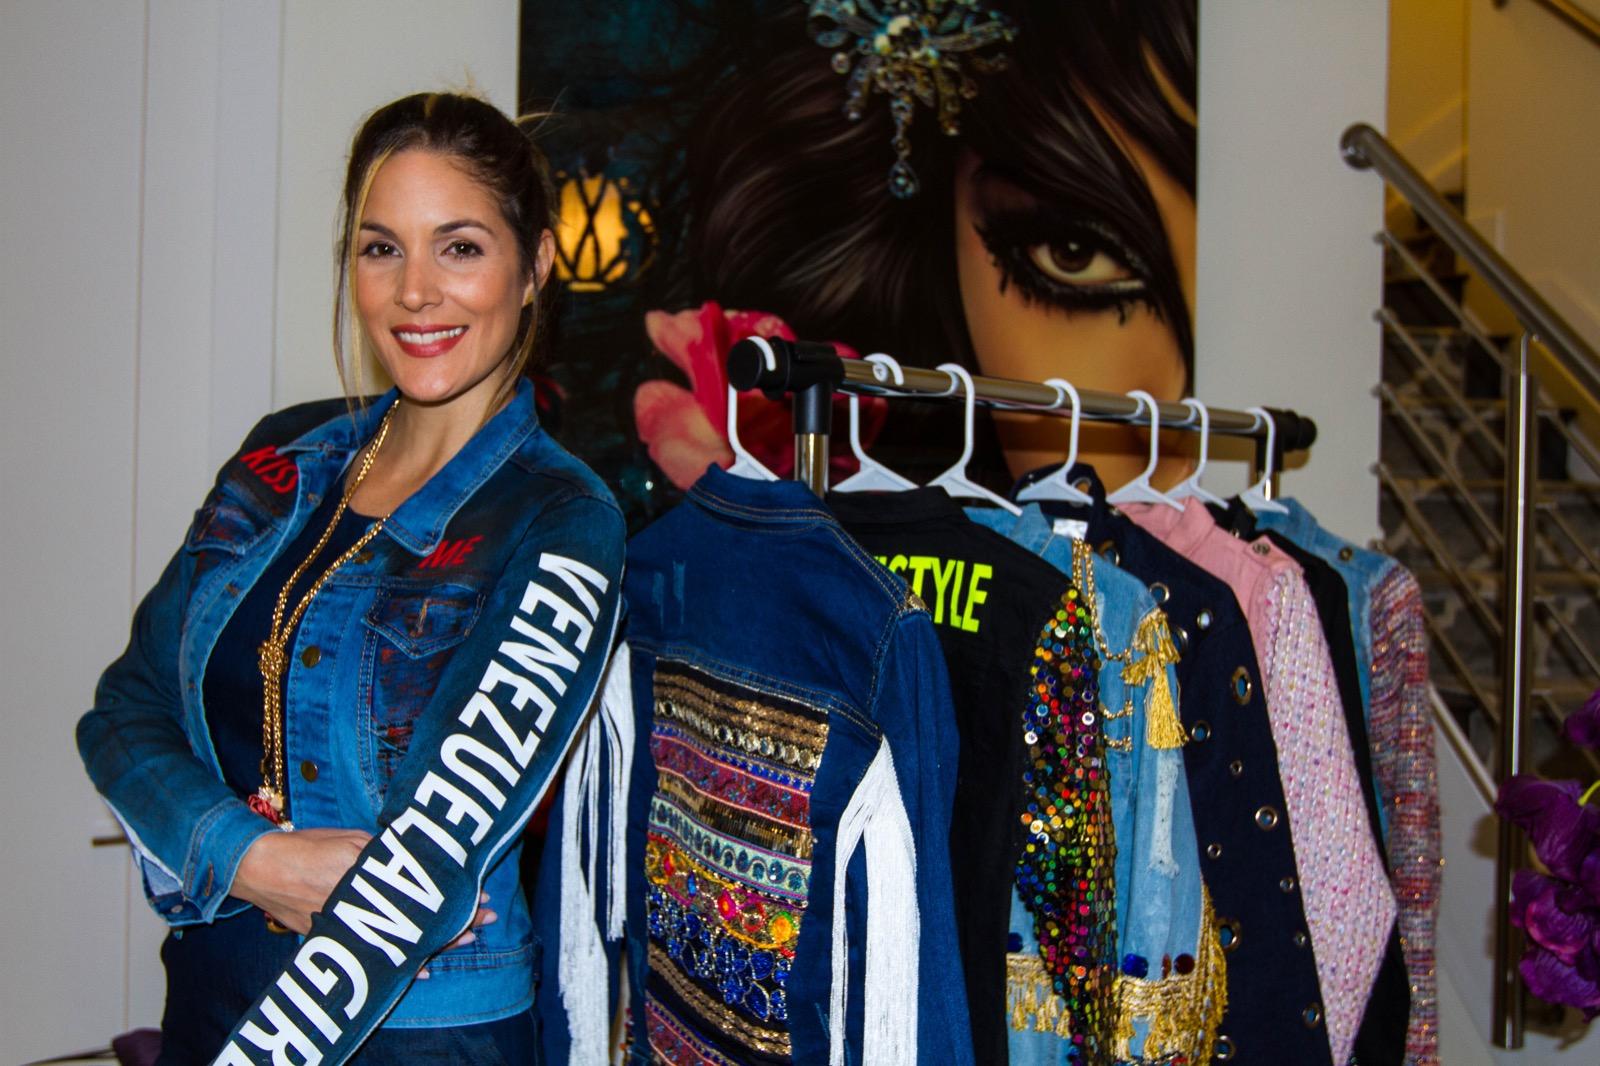 Silvana Santaella brilló en la Semana de la moda de Nueva York